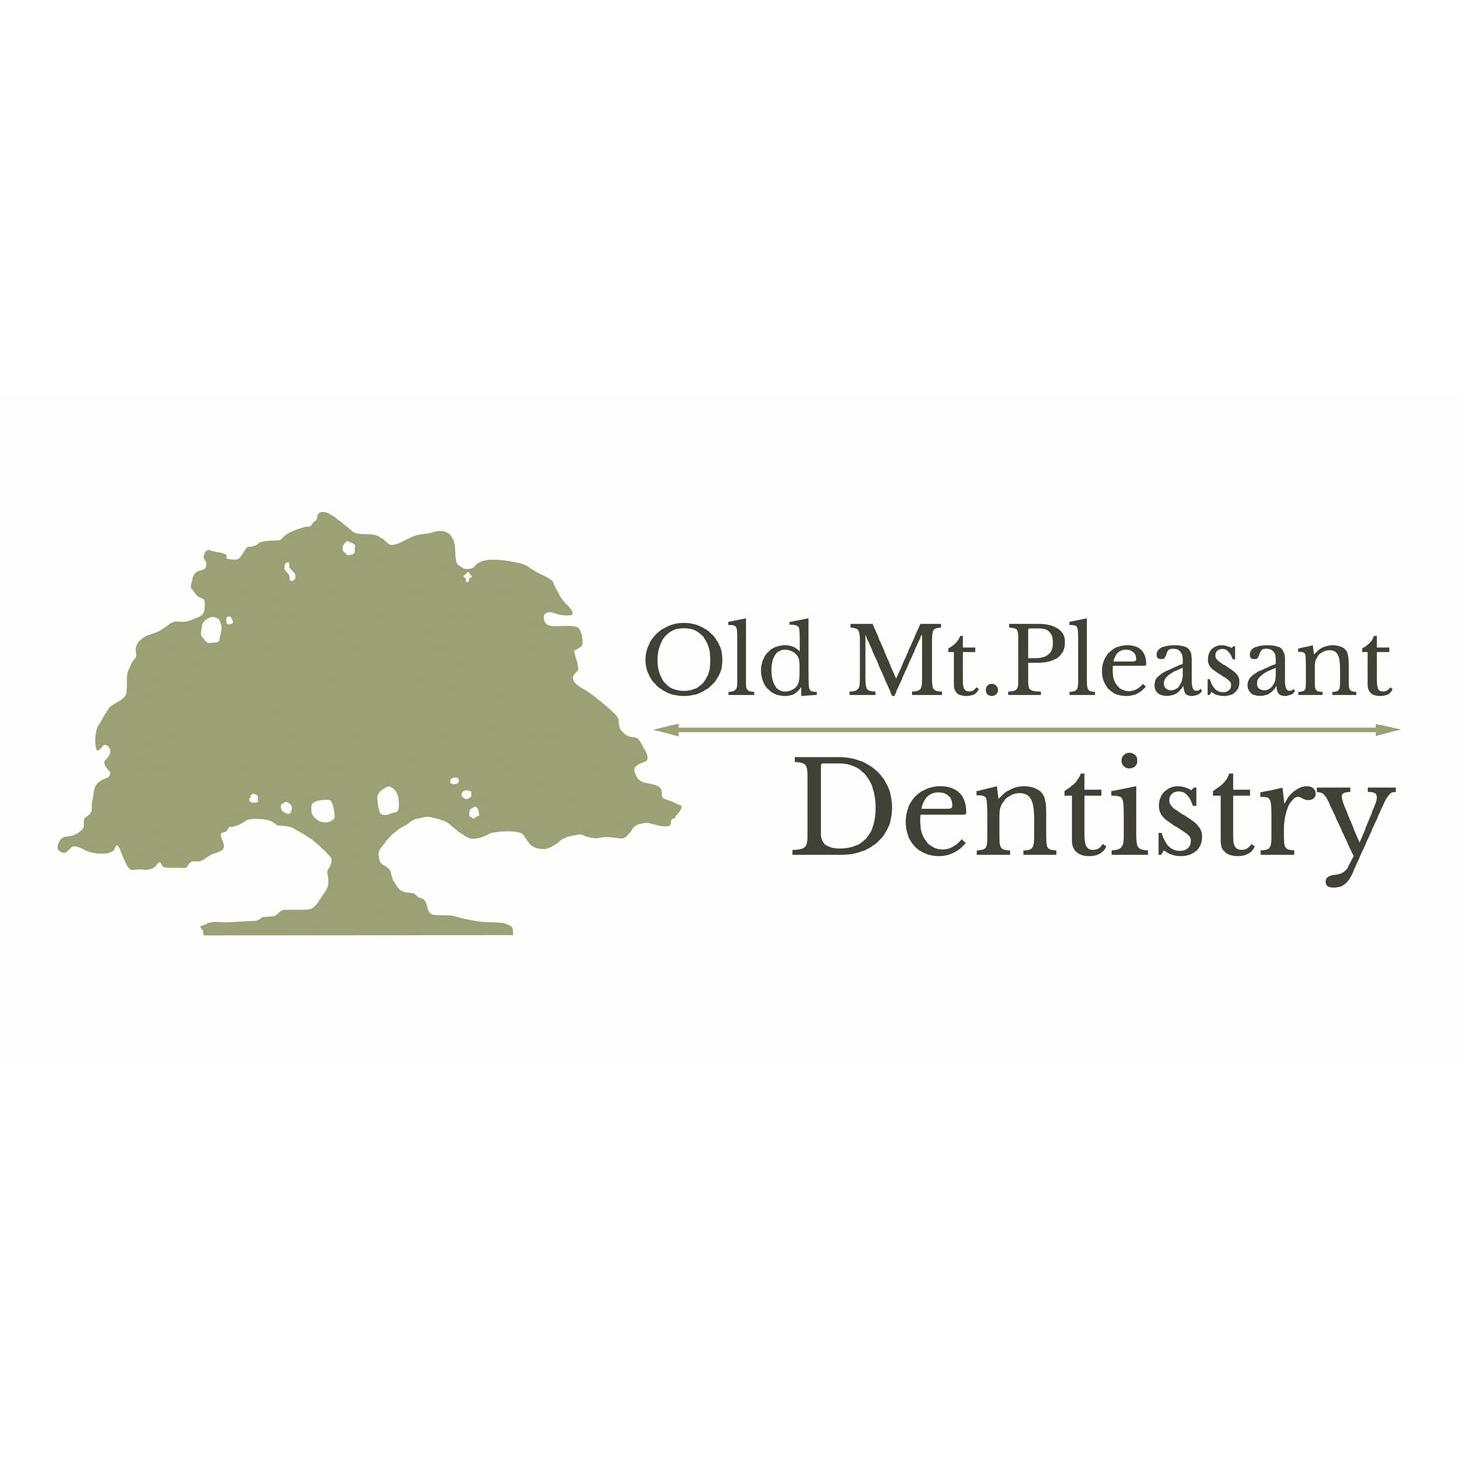 Old Mt Pleasant Dentistry